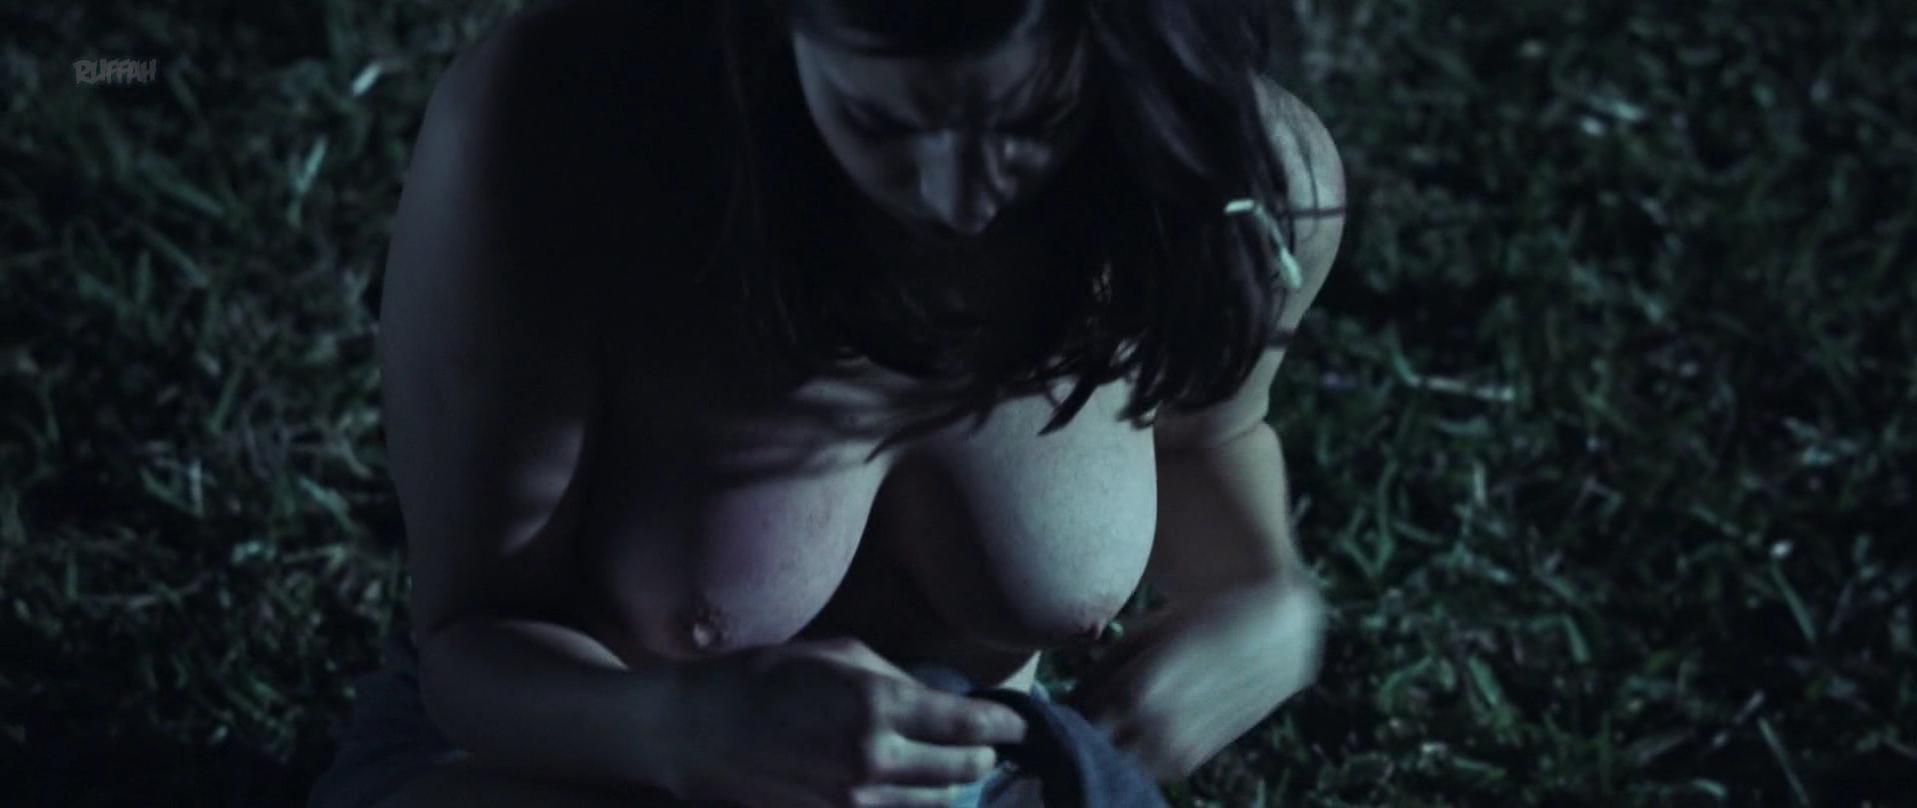 jemma dallender nude